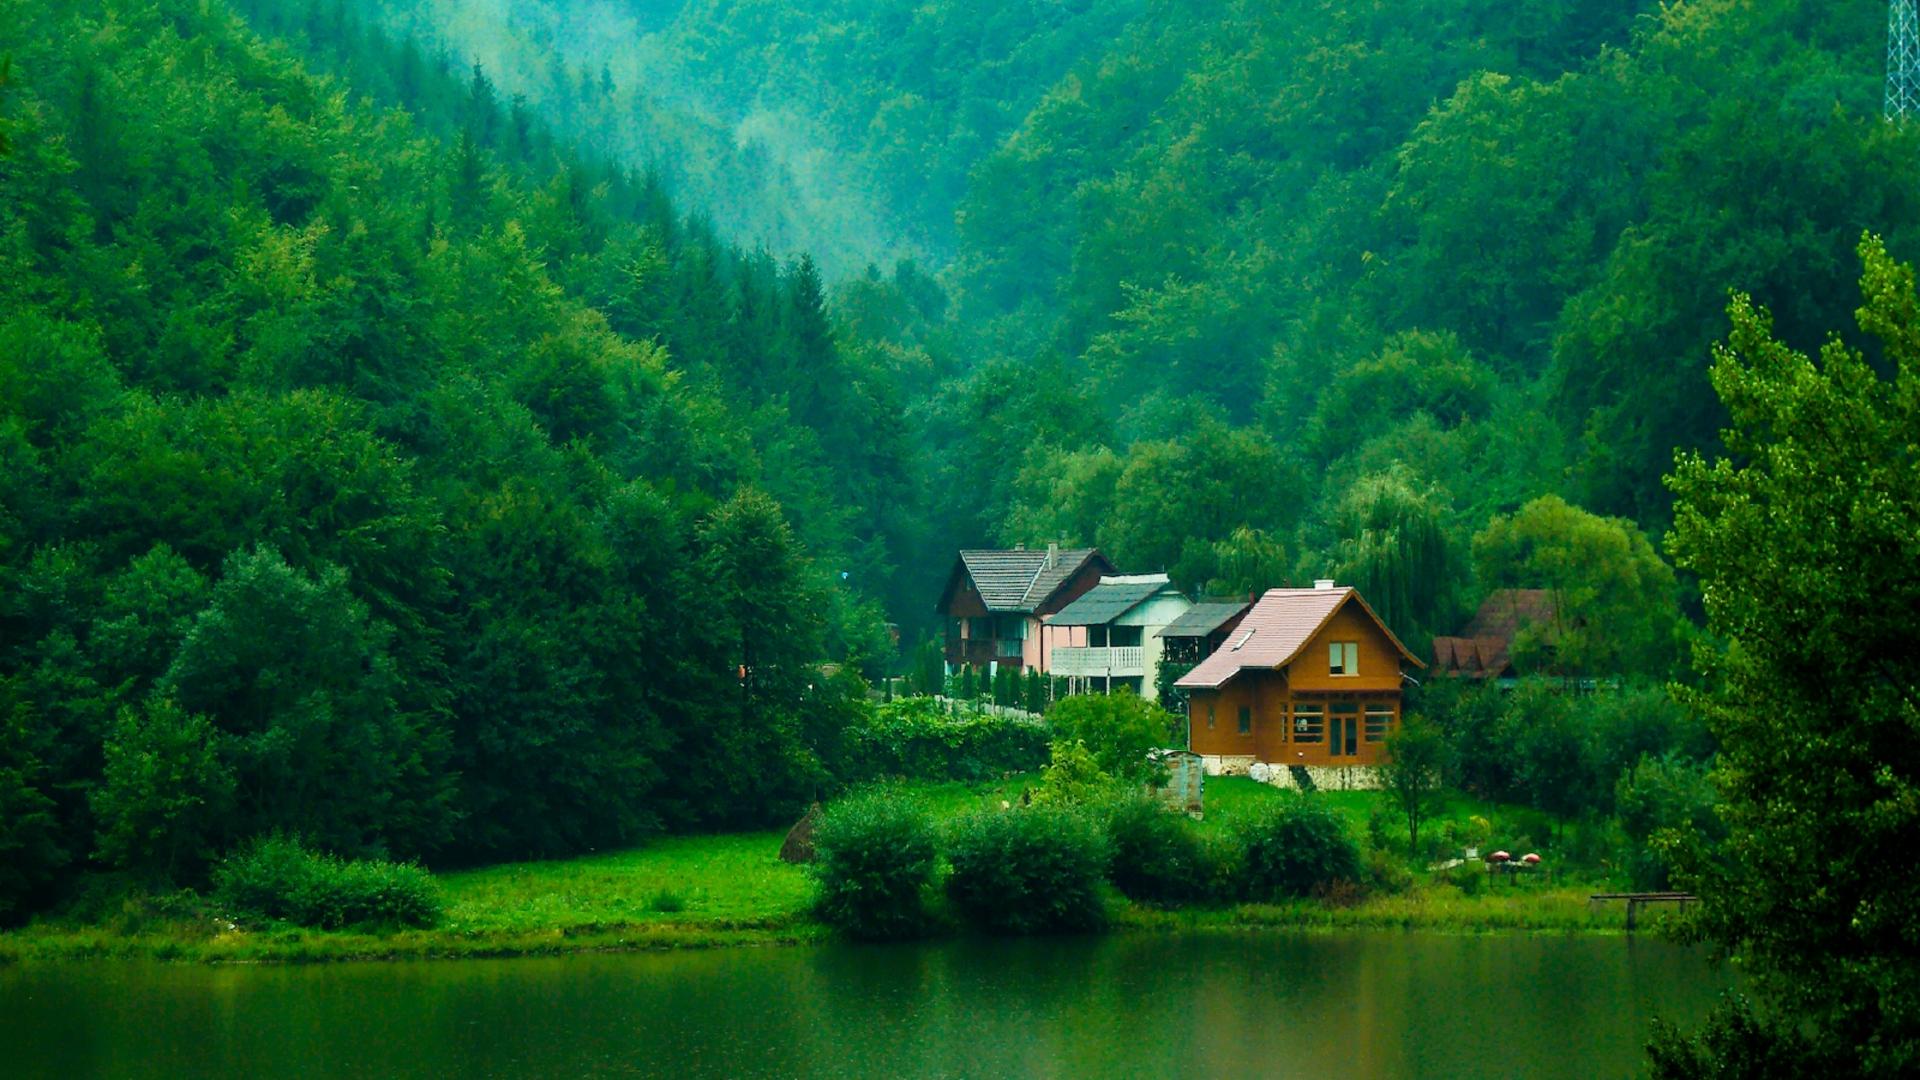 Hd wallpaper green - Lscapes Desktop Peaceful Green Nature Wallpapers Hd Free 291398